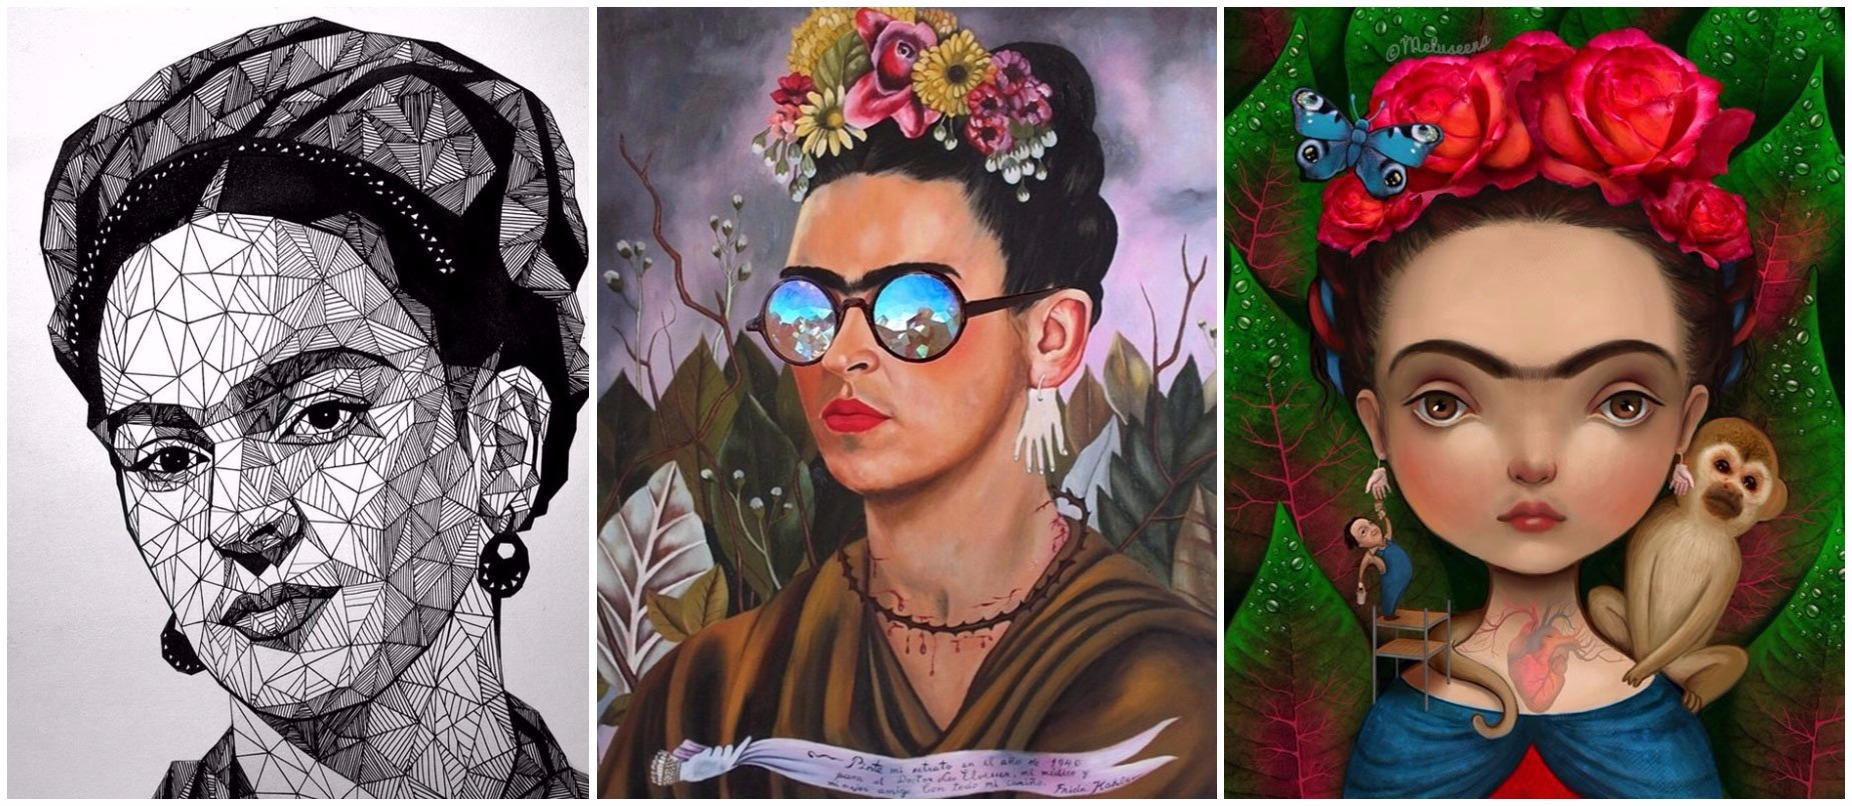 14 Retratos De Frida Kahlo Realizados Por Artistas De Todo El Mundo